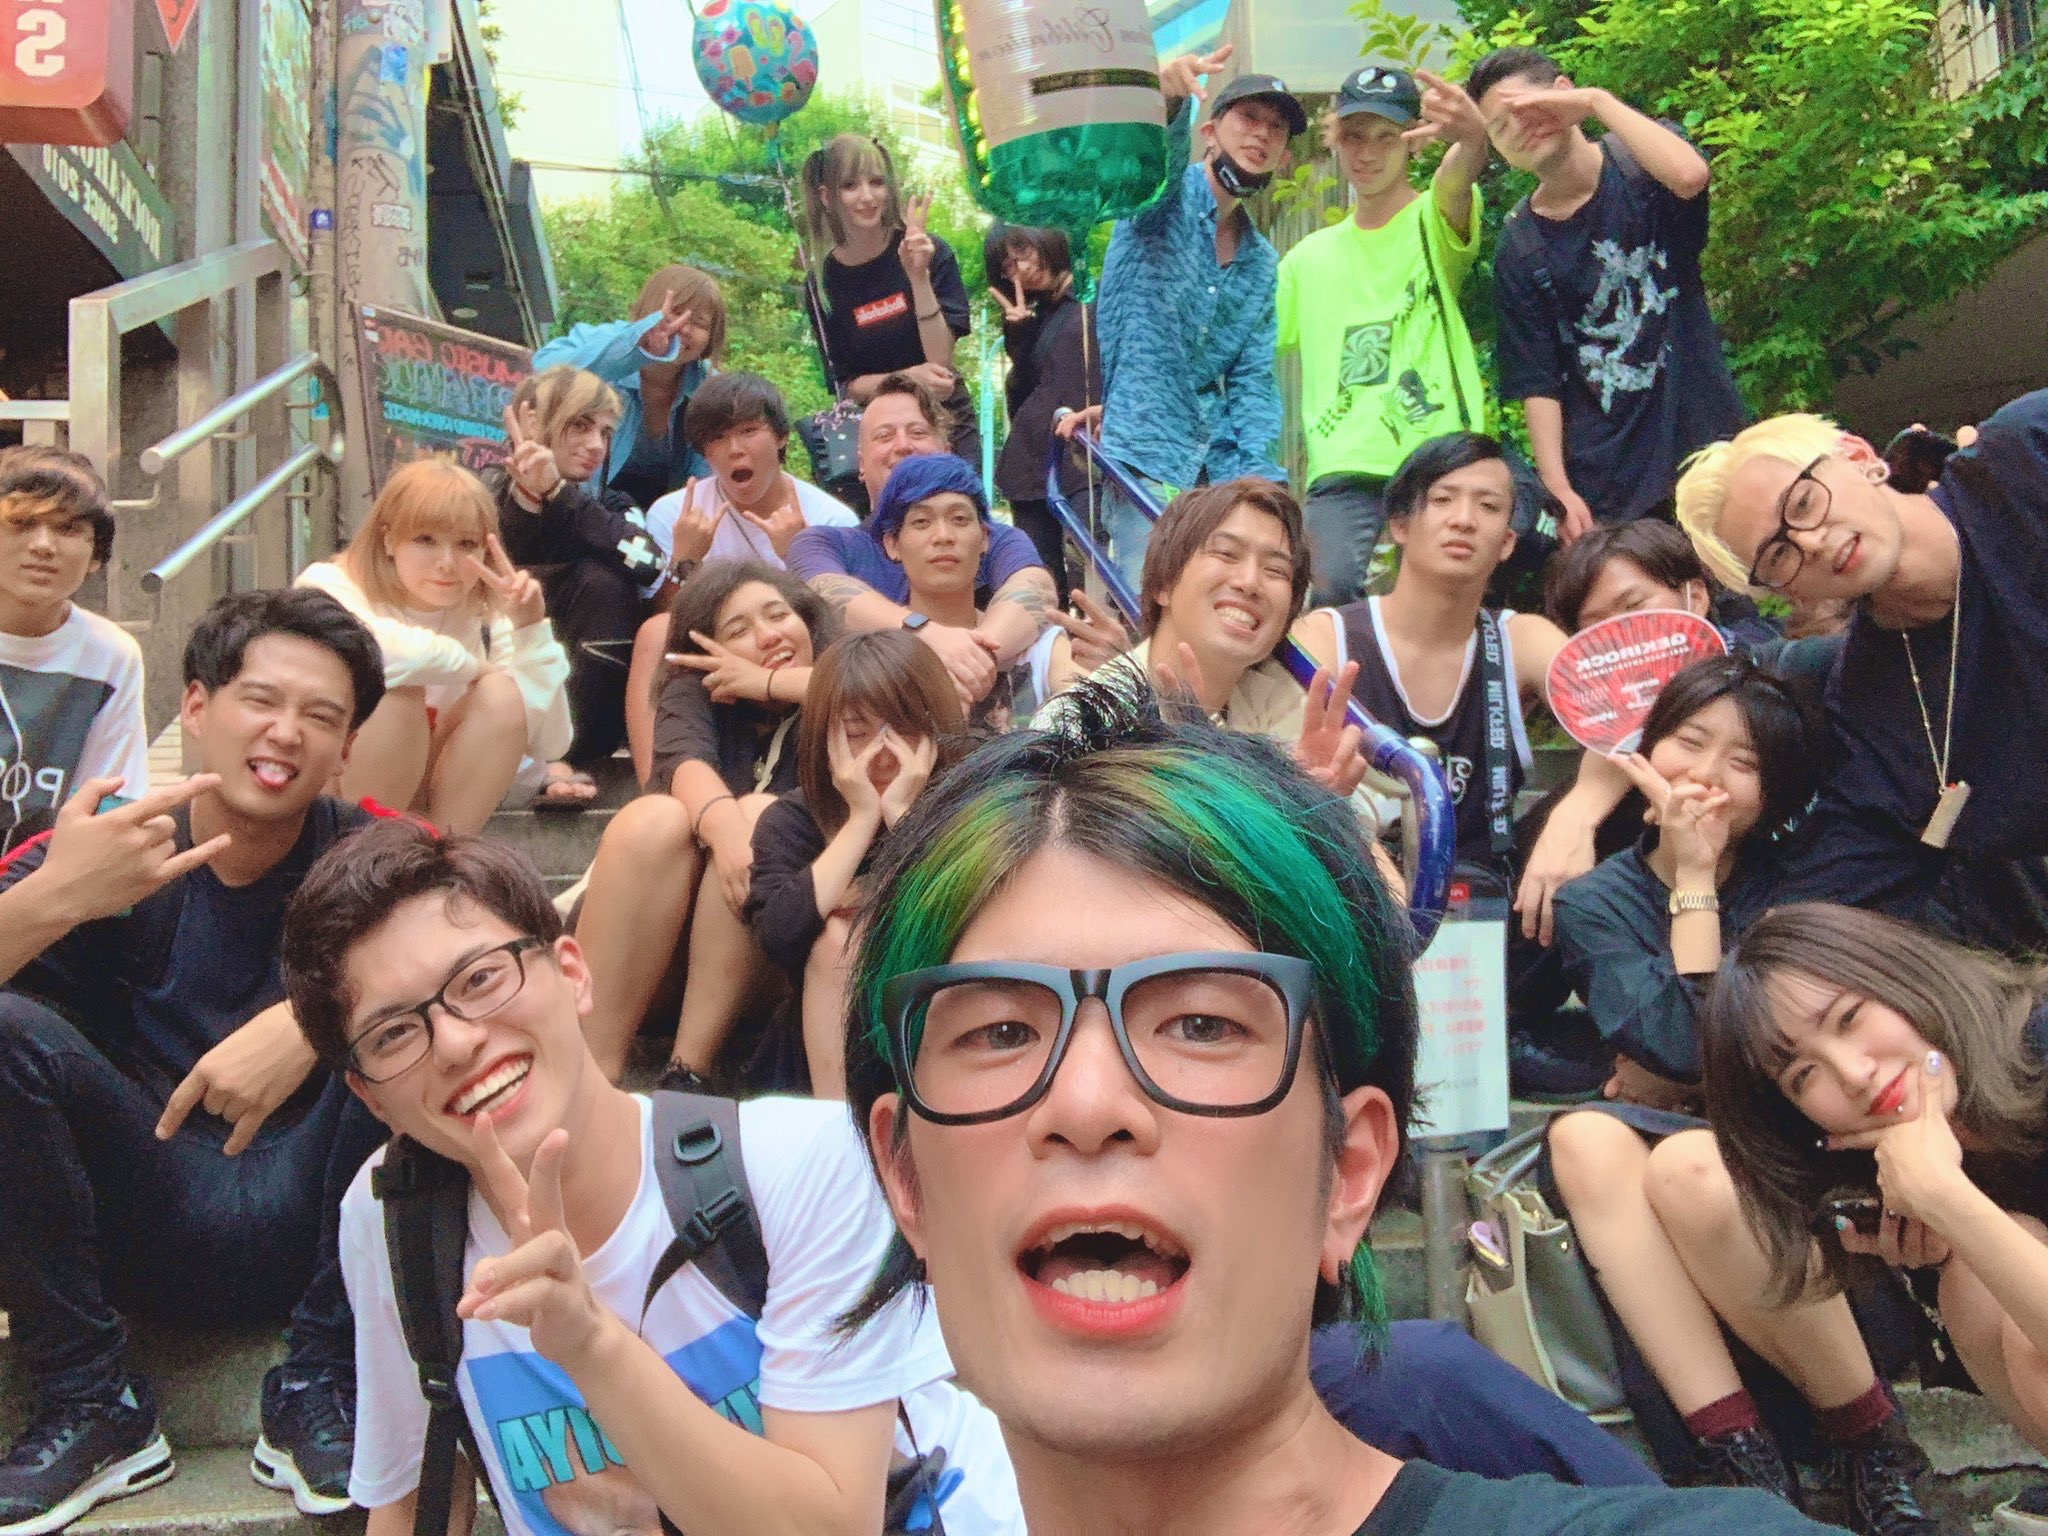 https://bar-rockaholic.jp/shibuya/blog/504C402A-5103-42C4-BE9A-9A4675F2617B.jpeg